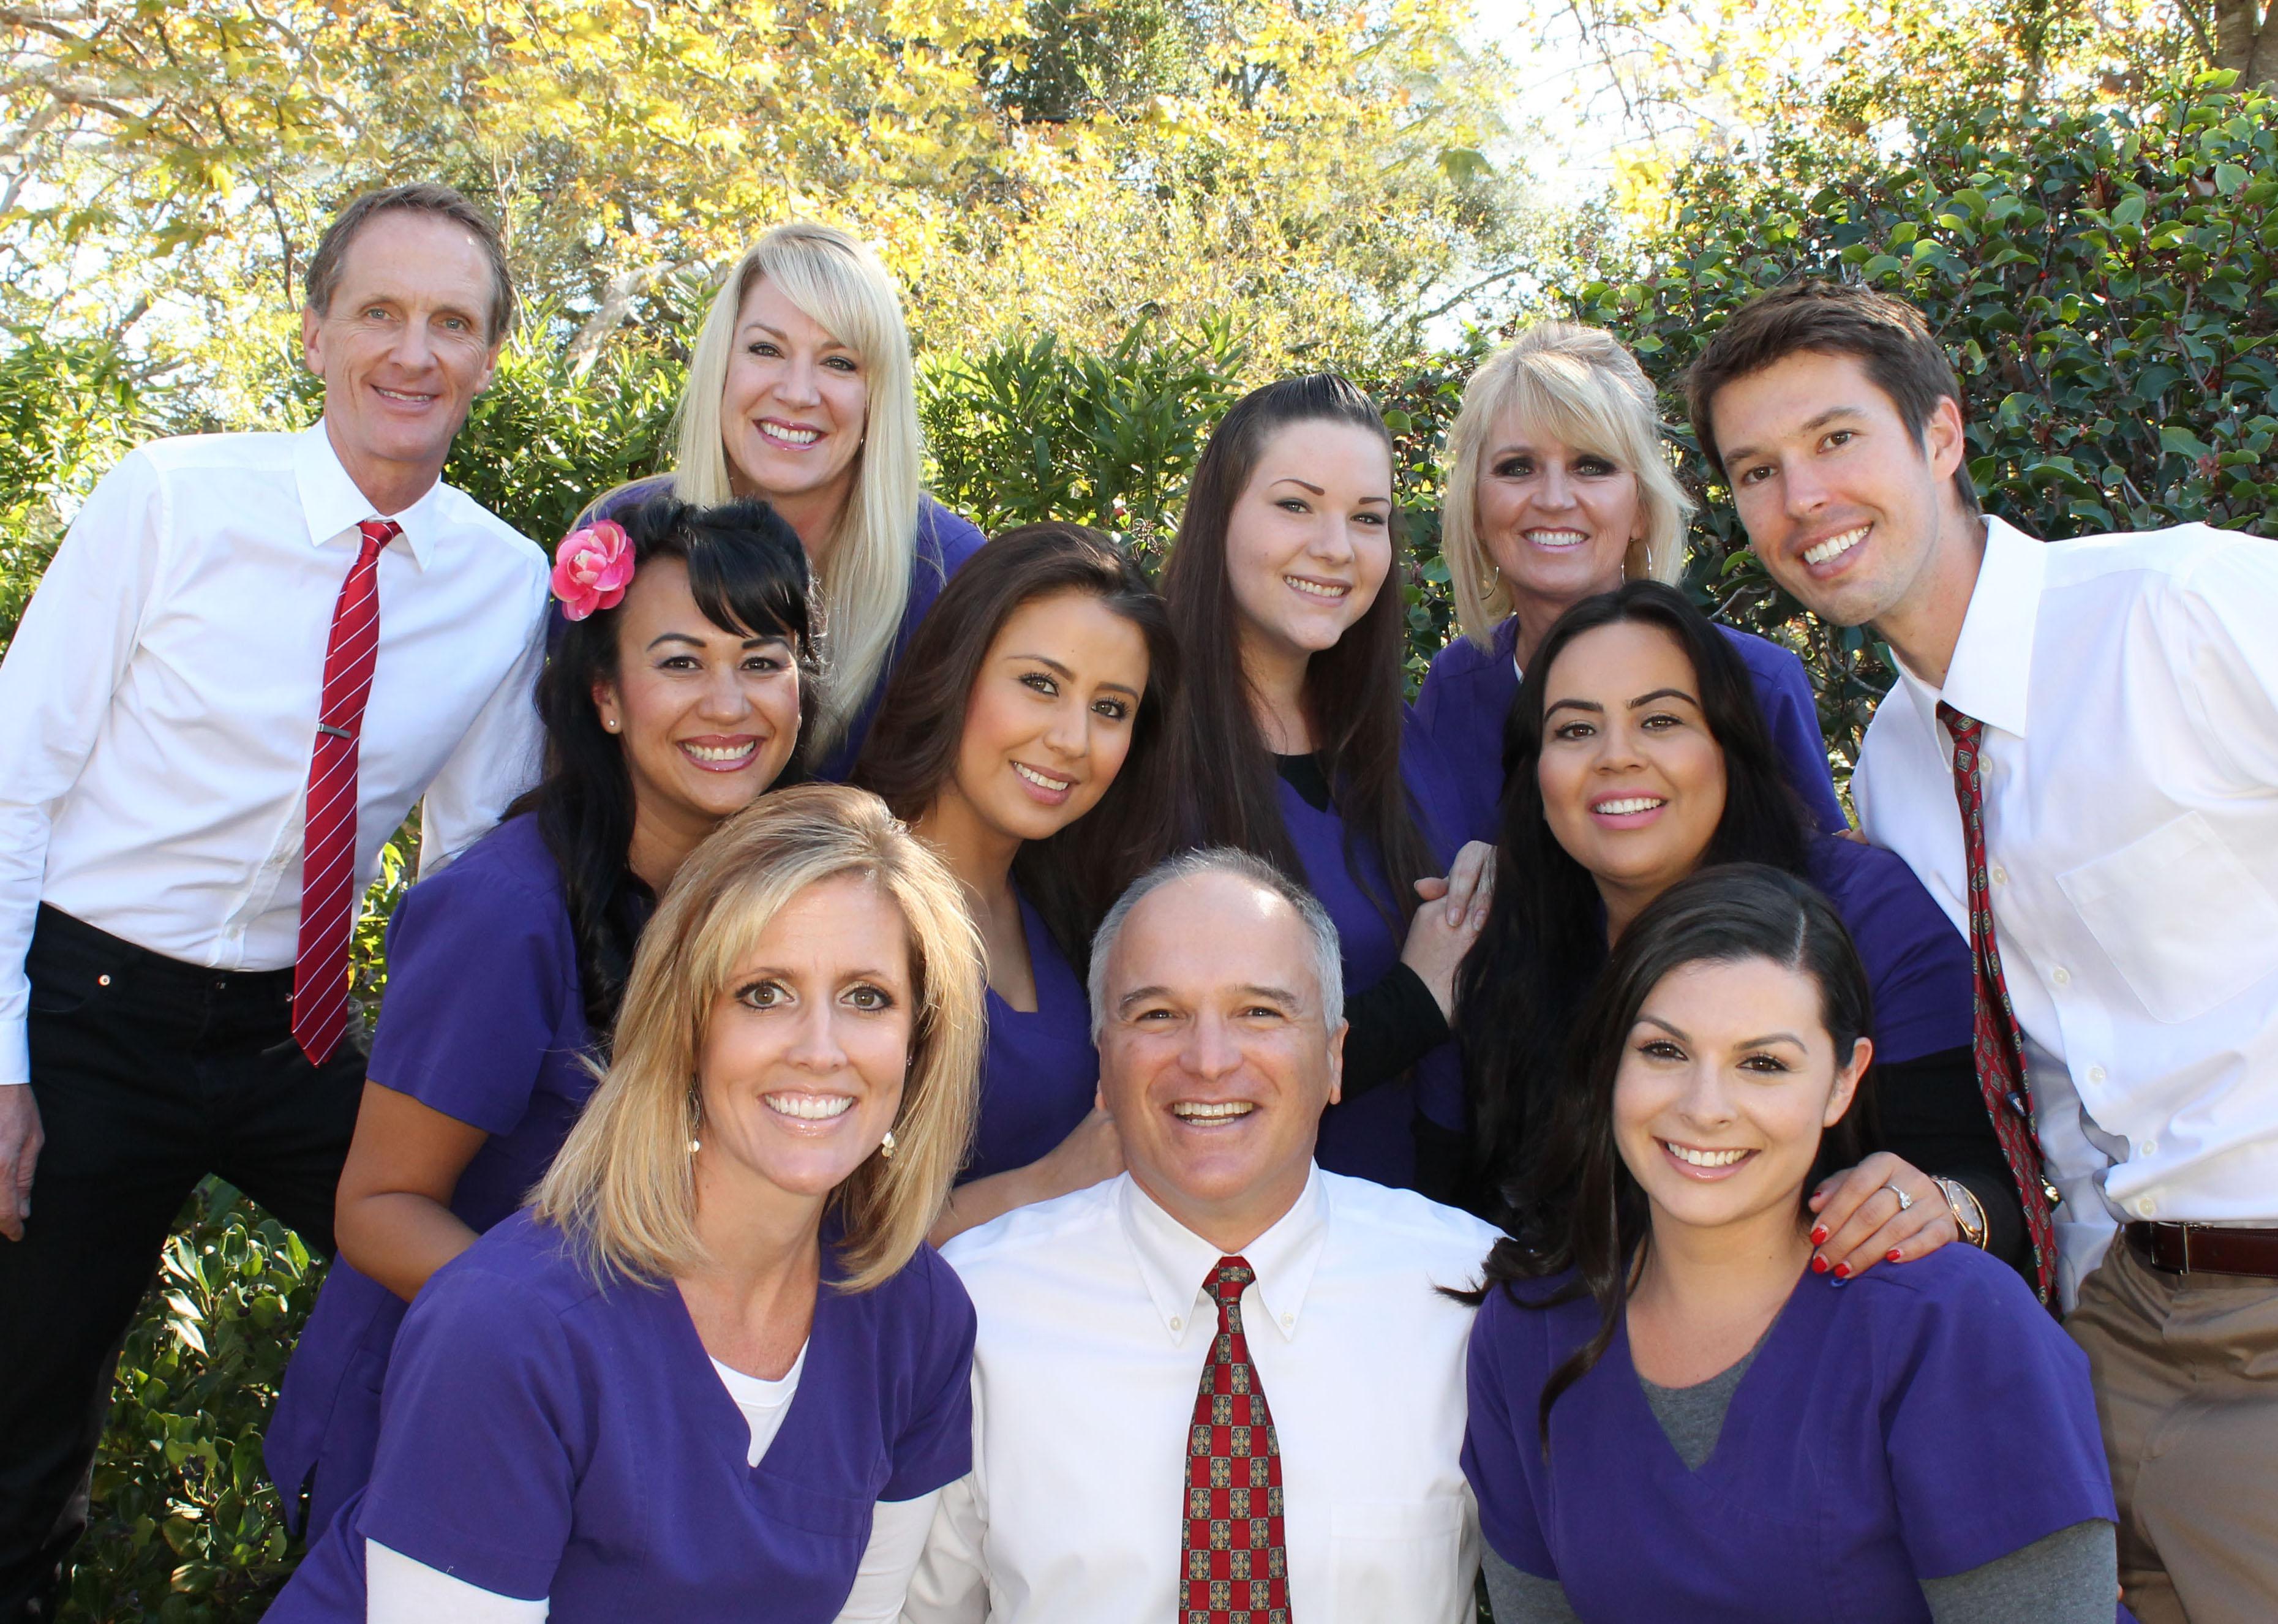 Santa Barbara Top Orthodontists Drs. Edstrom, Trigonis and Swenson and Team 2016